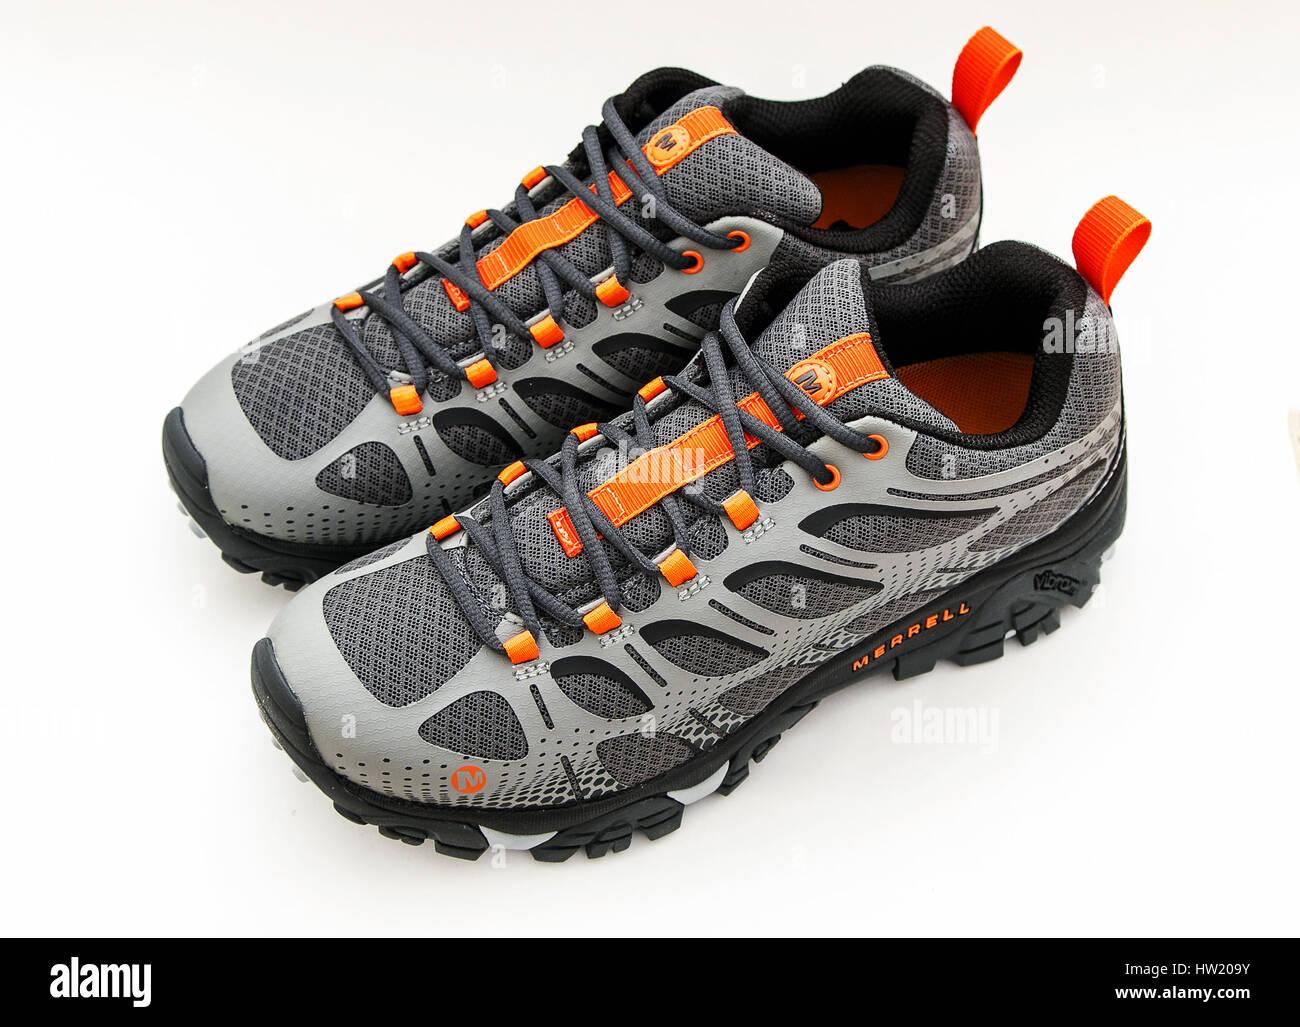 New Pair Merrell Walking Shoes Stockfotos & New Pair Merrell